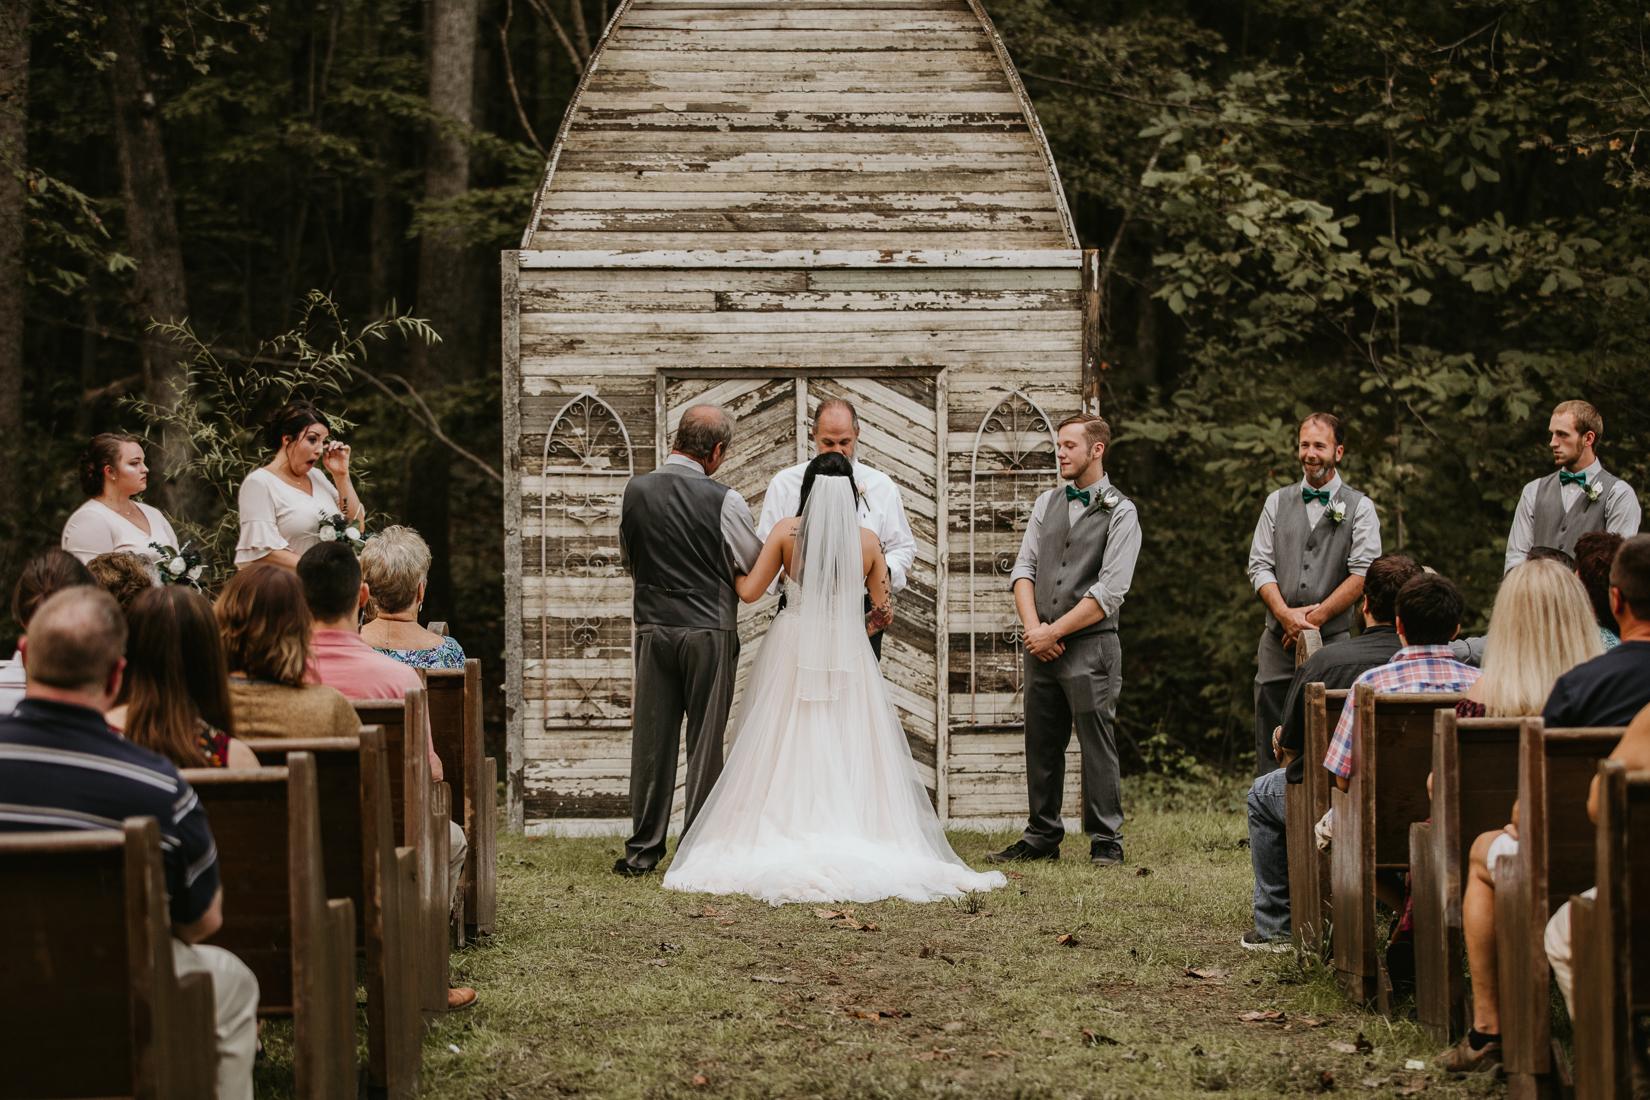 olivia_zay_wedding_09_2018-9627.jpg